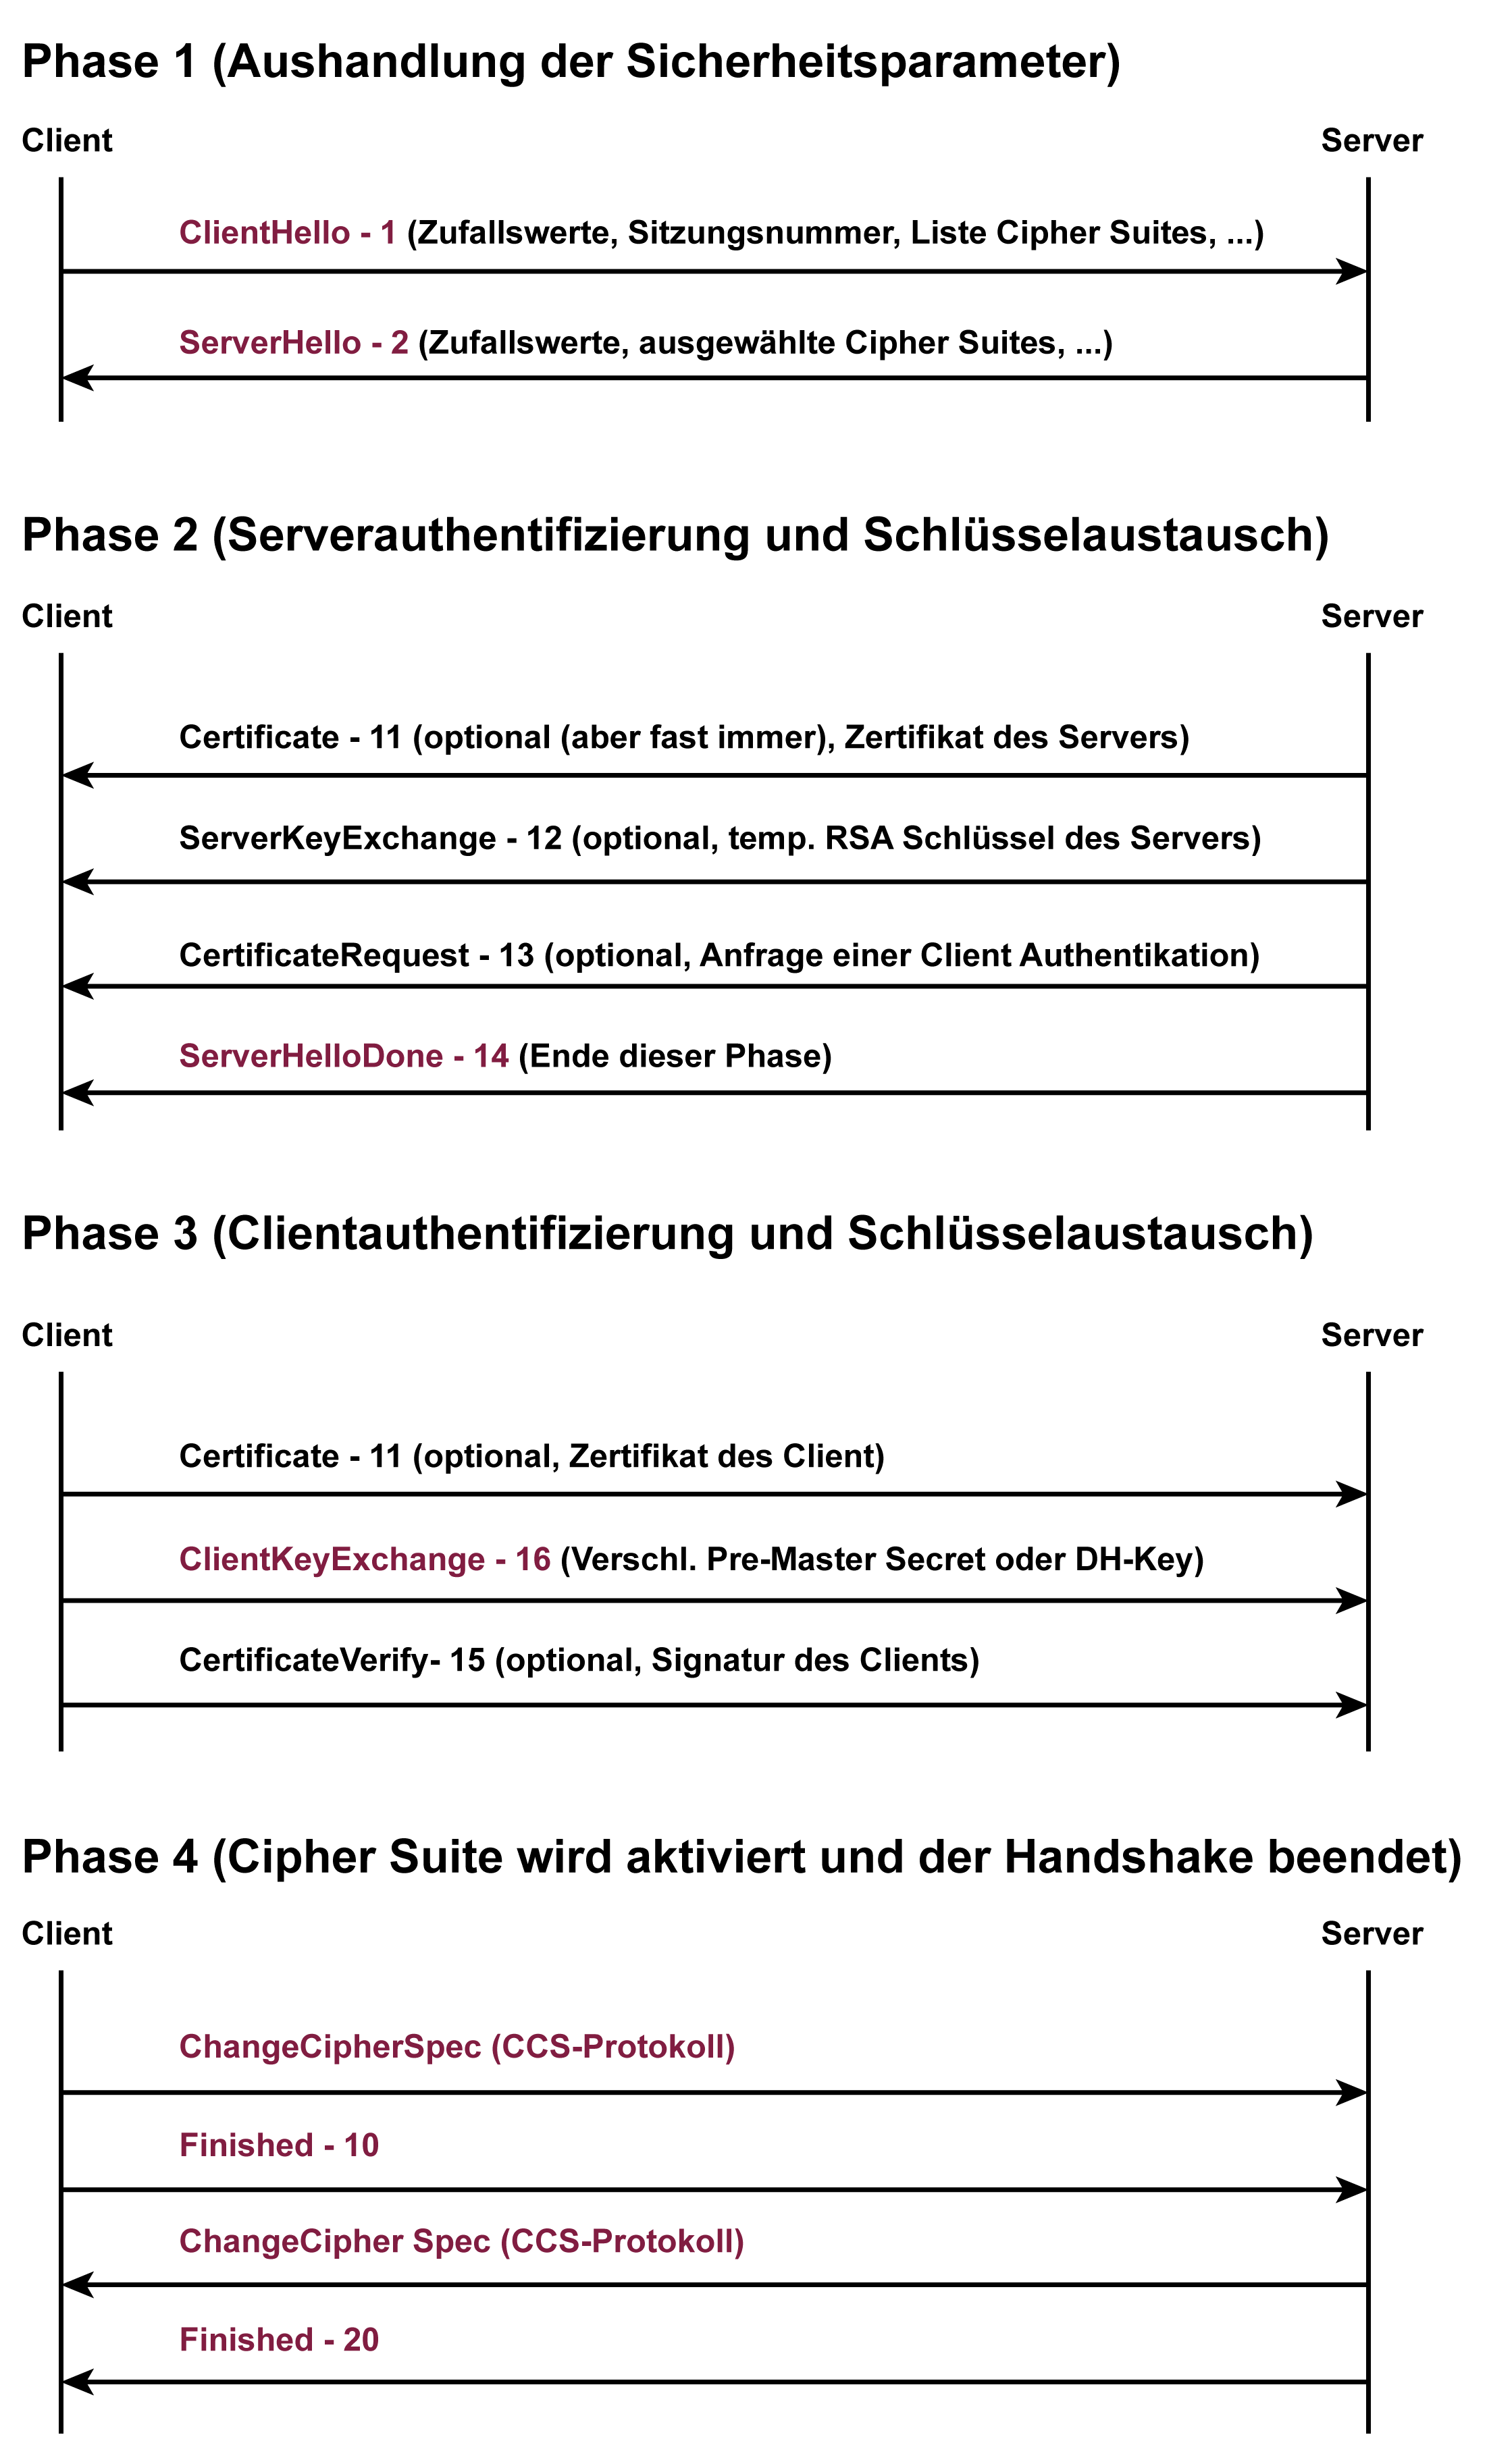 TLS Handshake Protokoll - Glossar Cyber-Sicherheit - Prof. Norbert Pohlmann